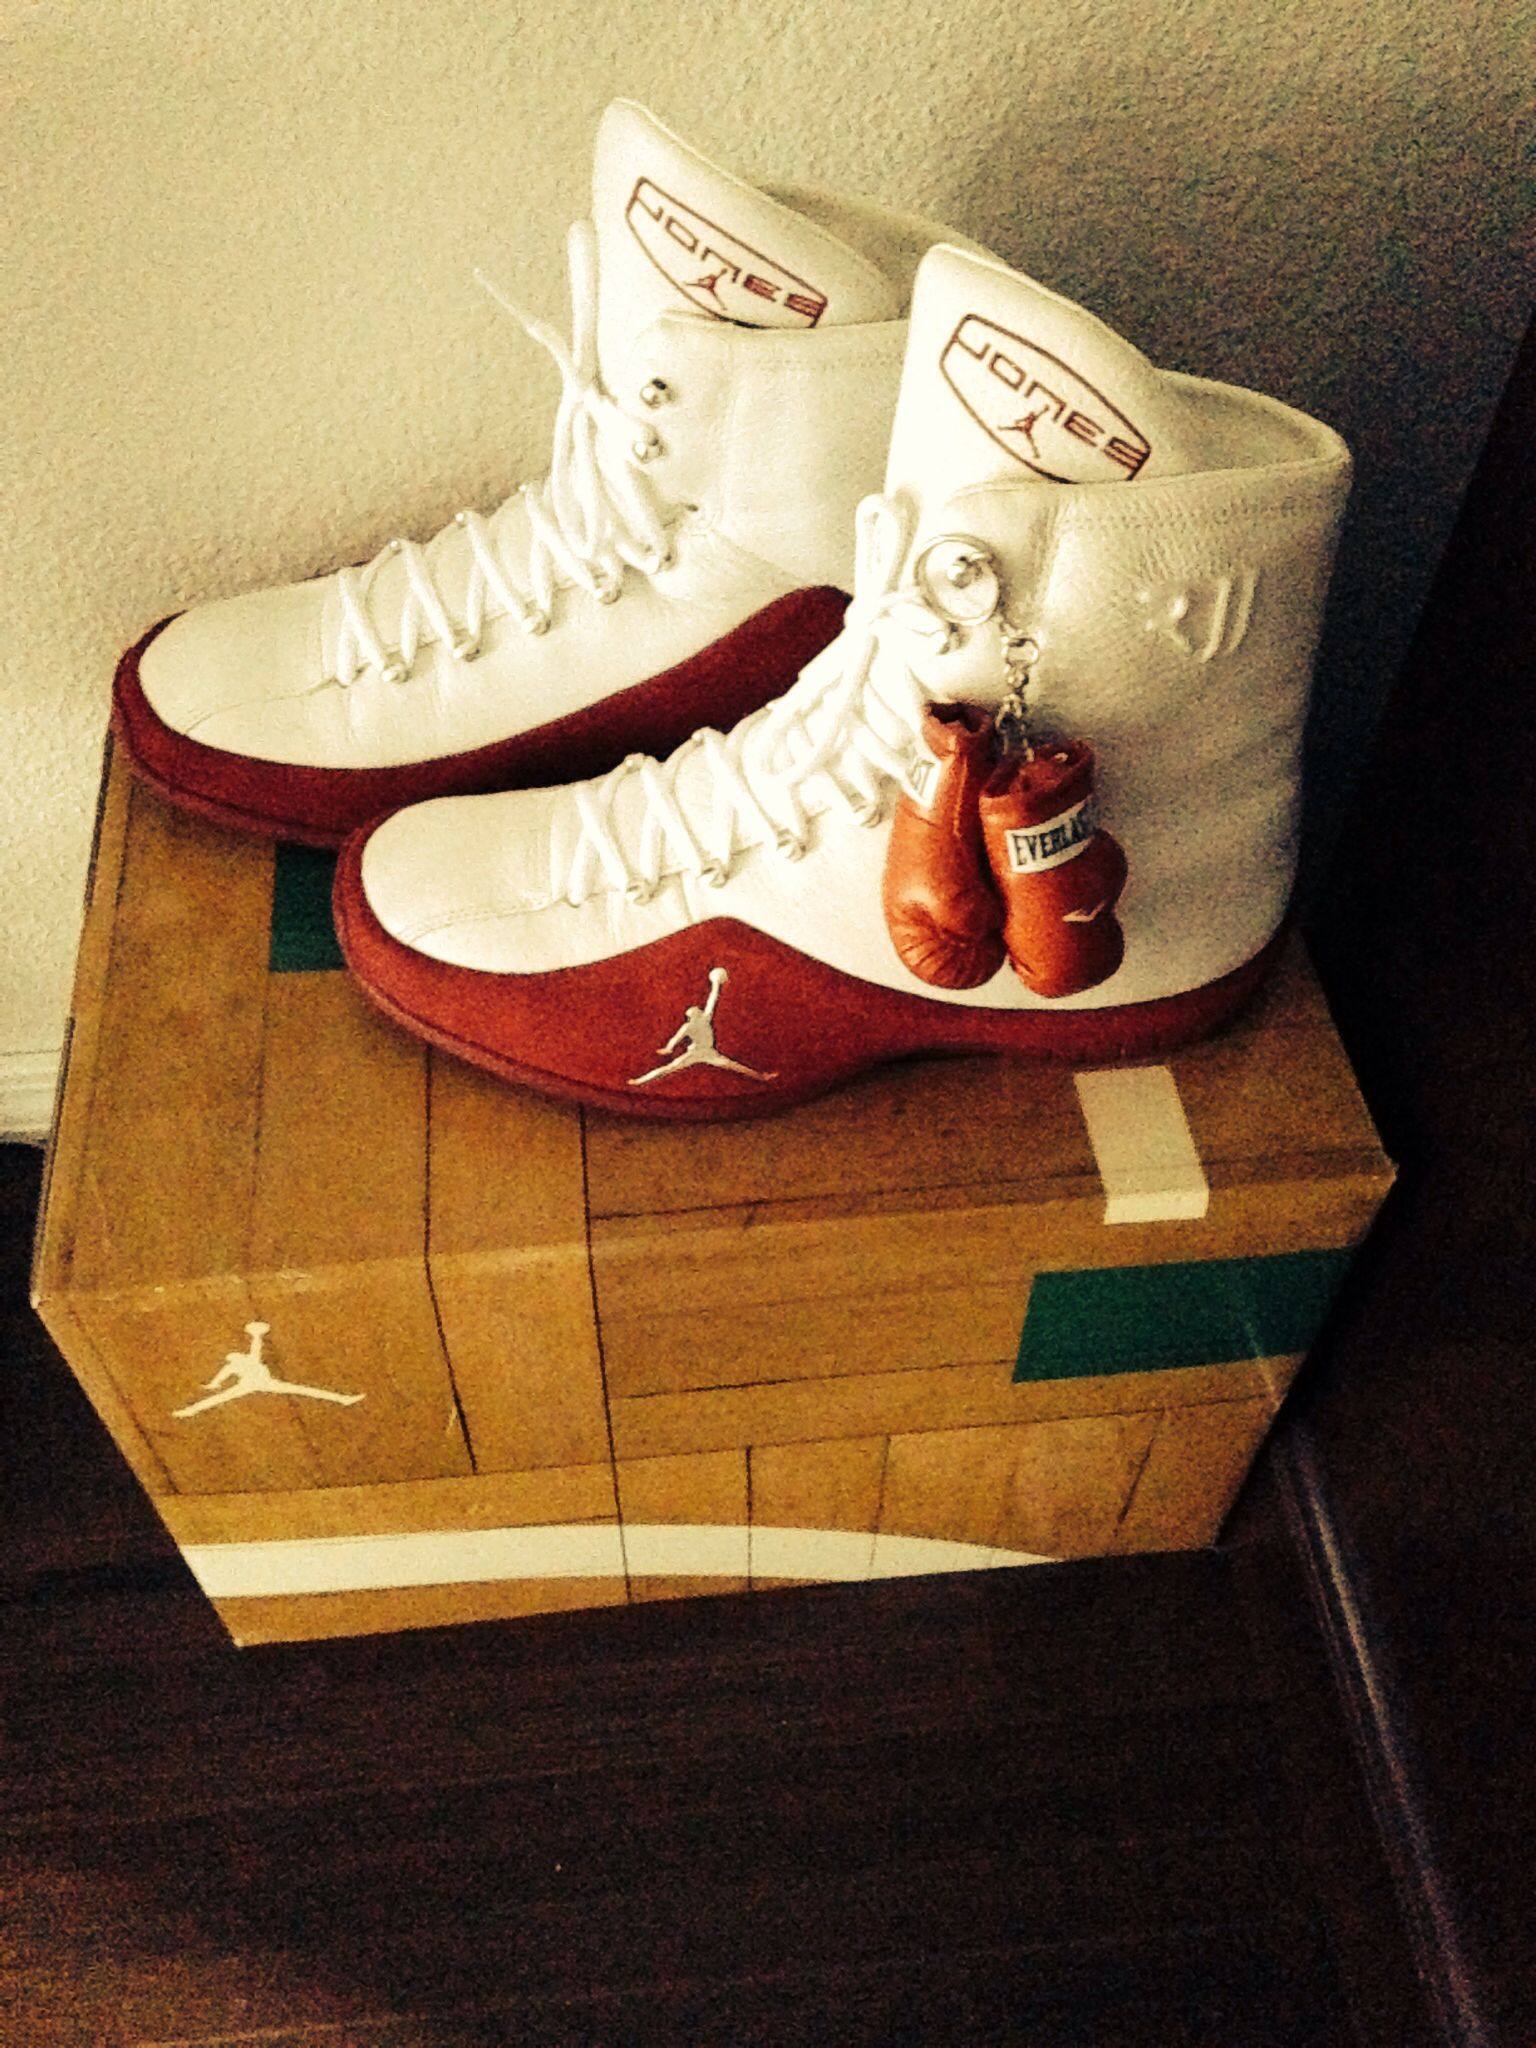 Rare) Roy Jones Jr. Boxing shoes made